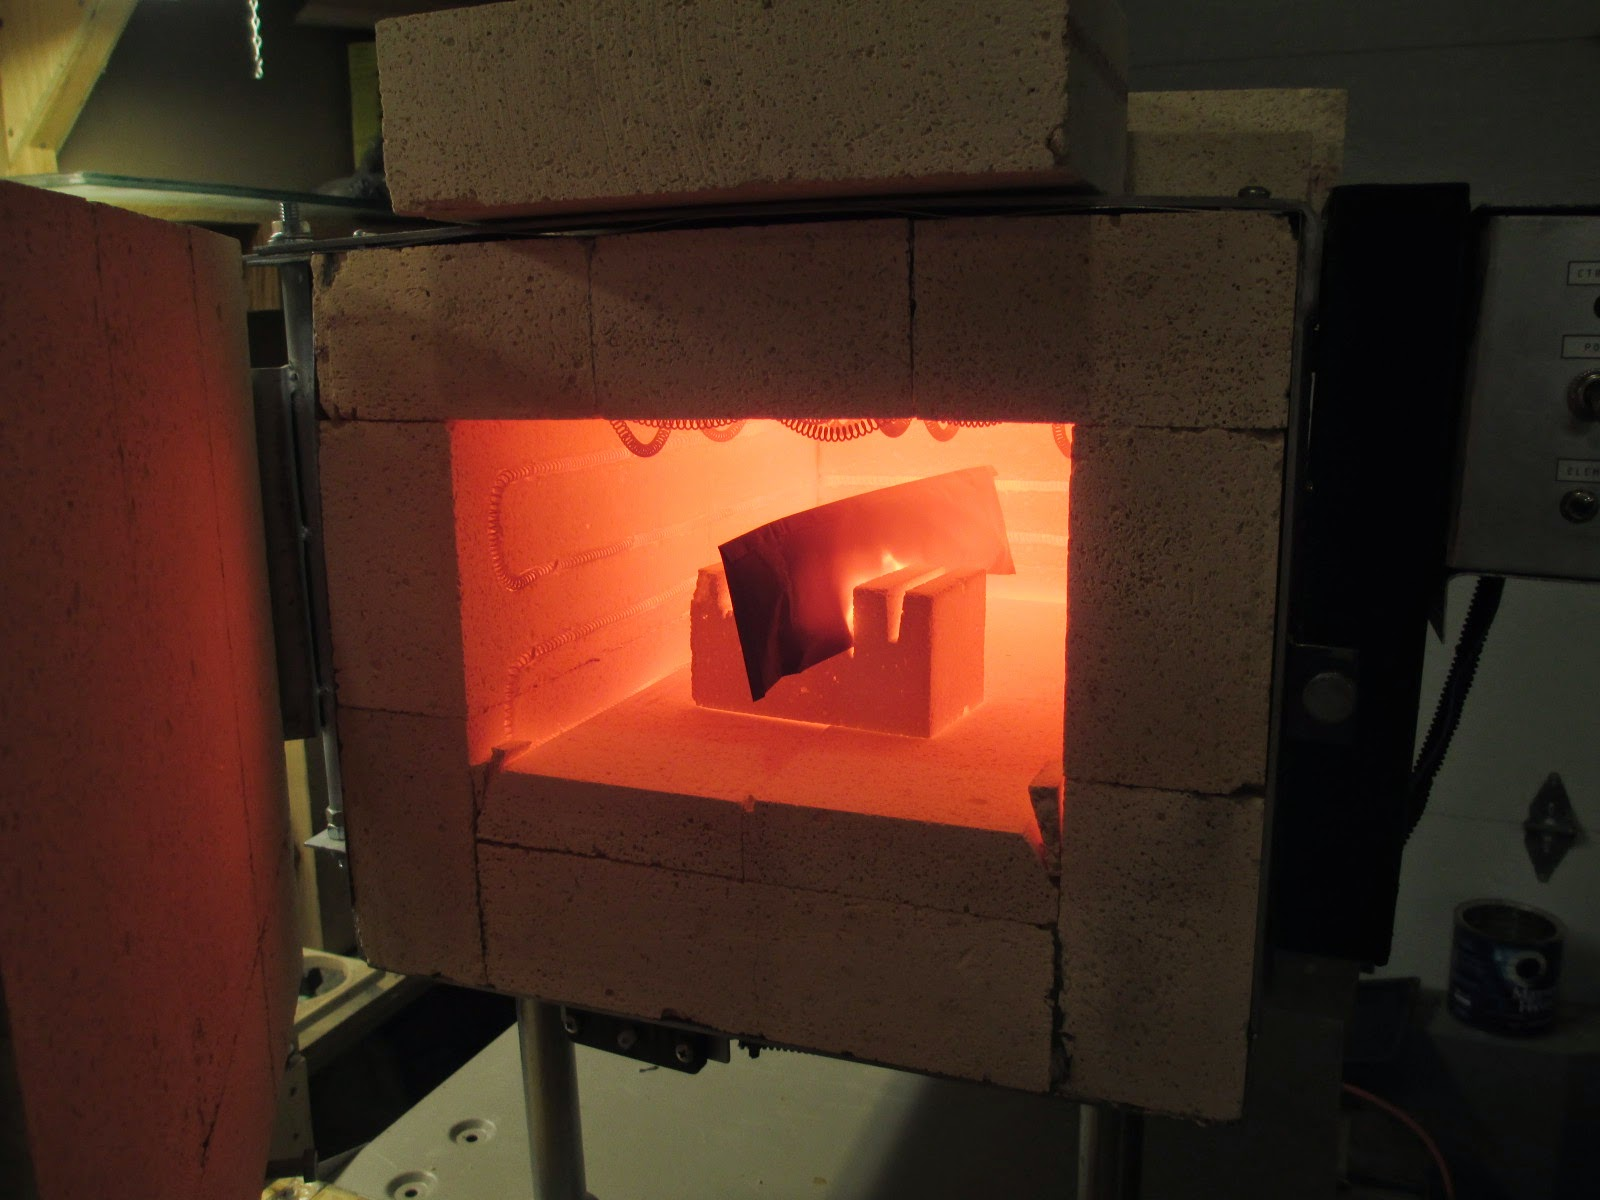 Heat Treating Oven : Diy knifemaker s info center dh heat treatment